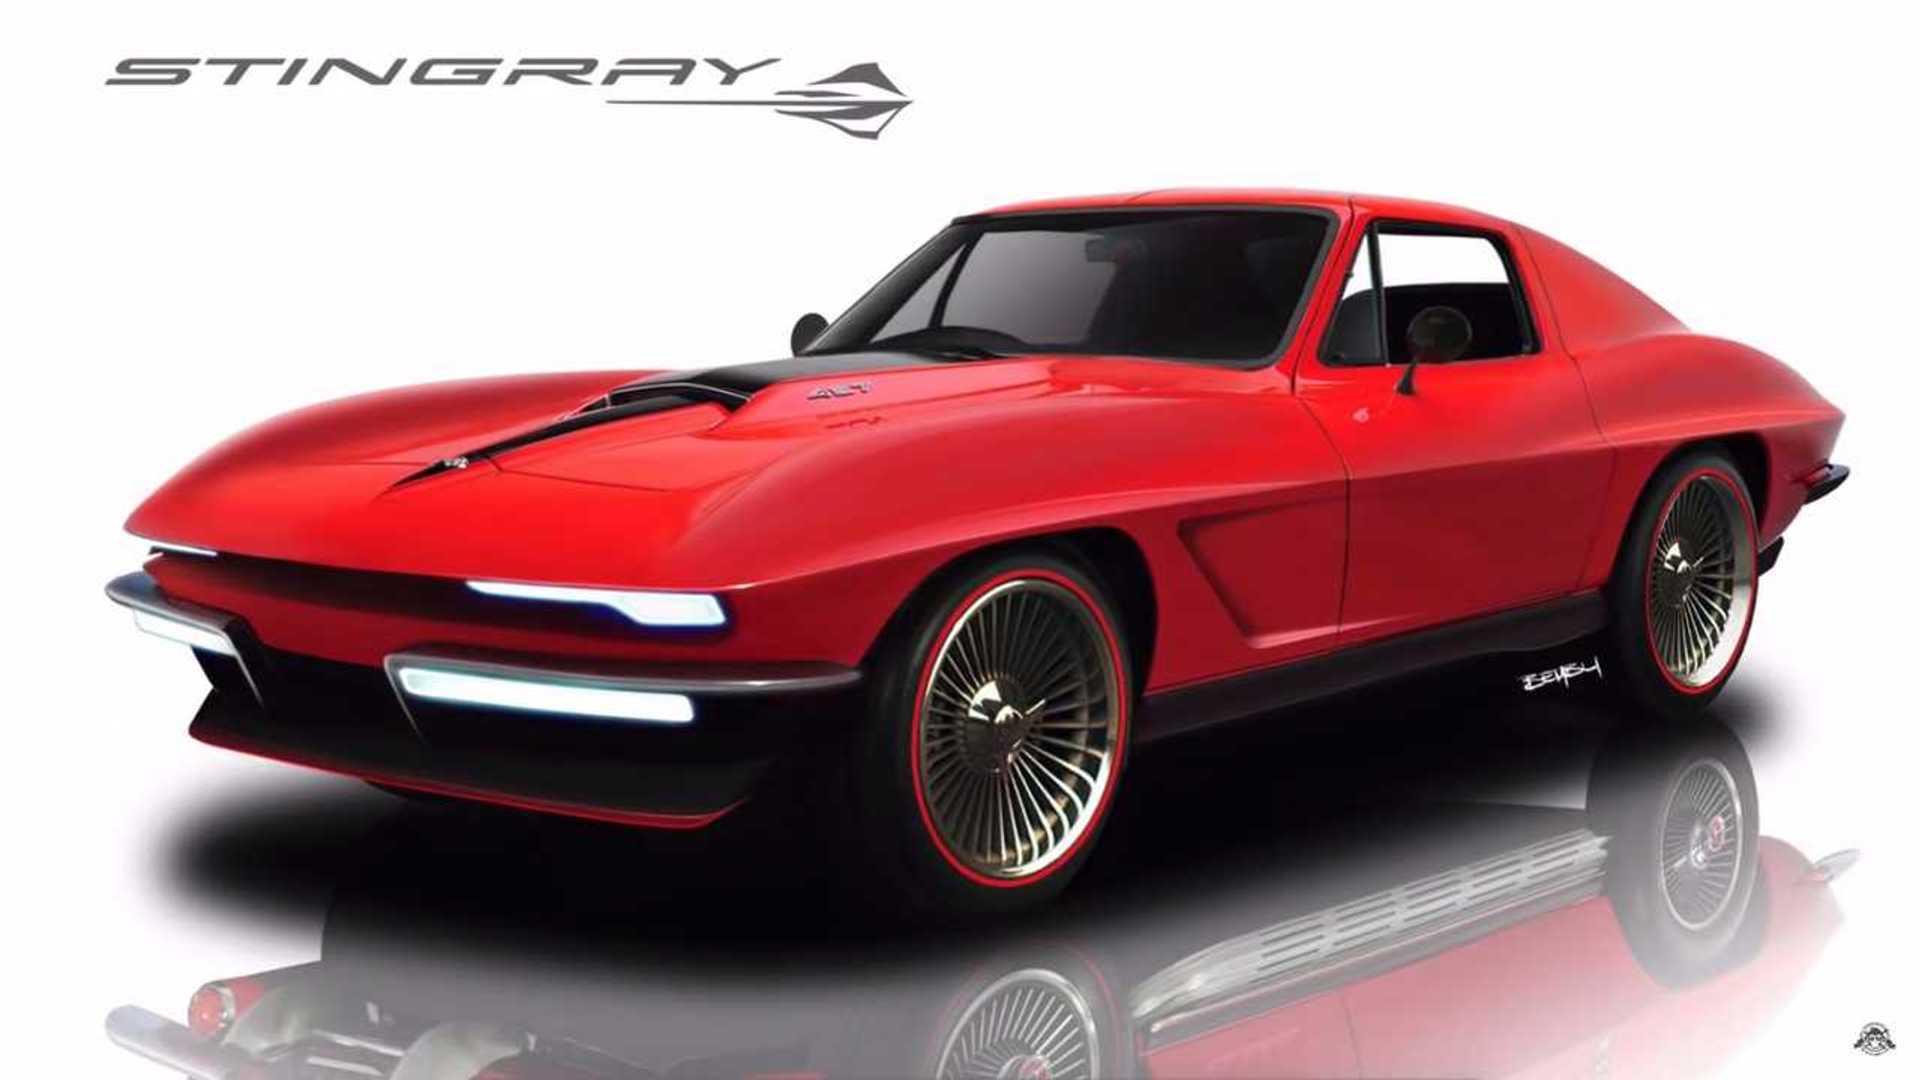 Retro-Modern 1967 Chevy Corvette Stingray Is The Stuff Of Dreams